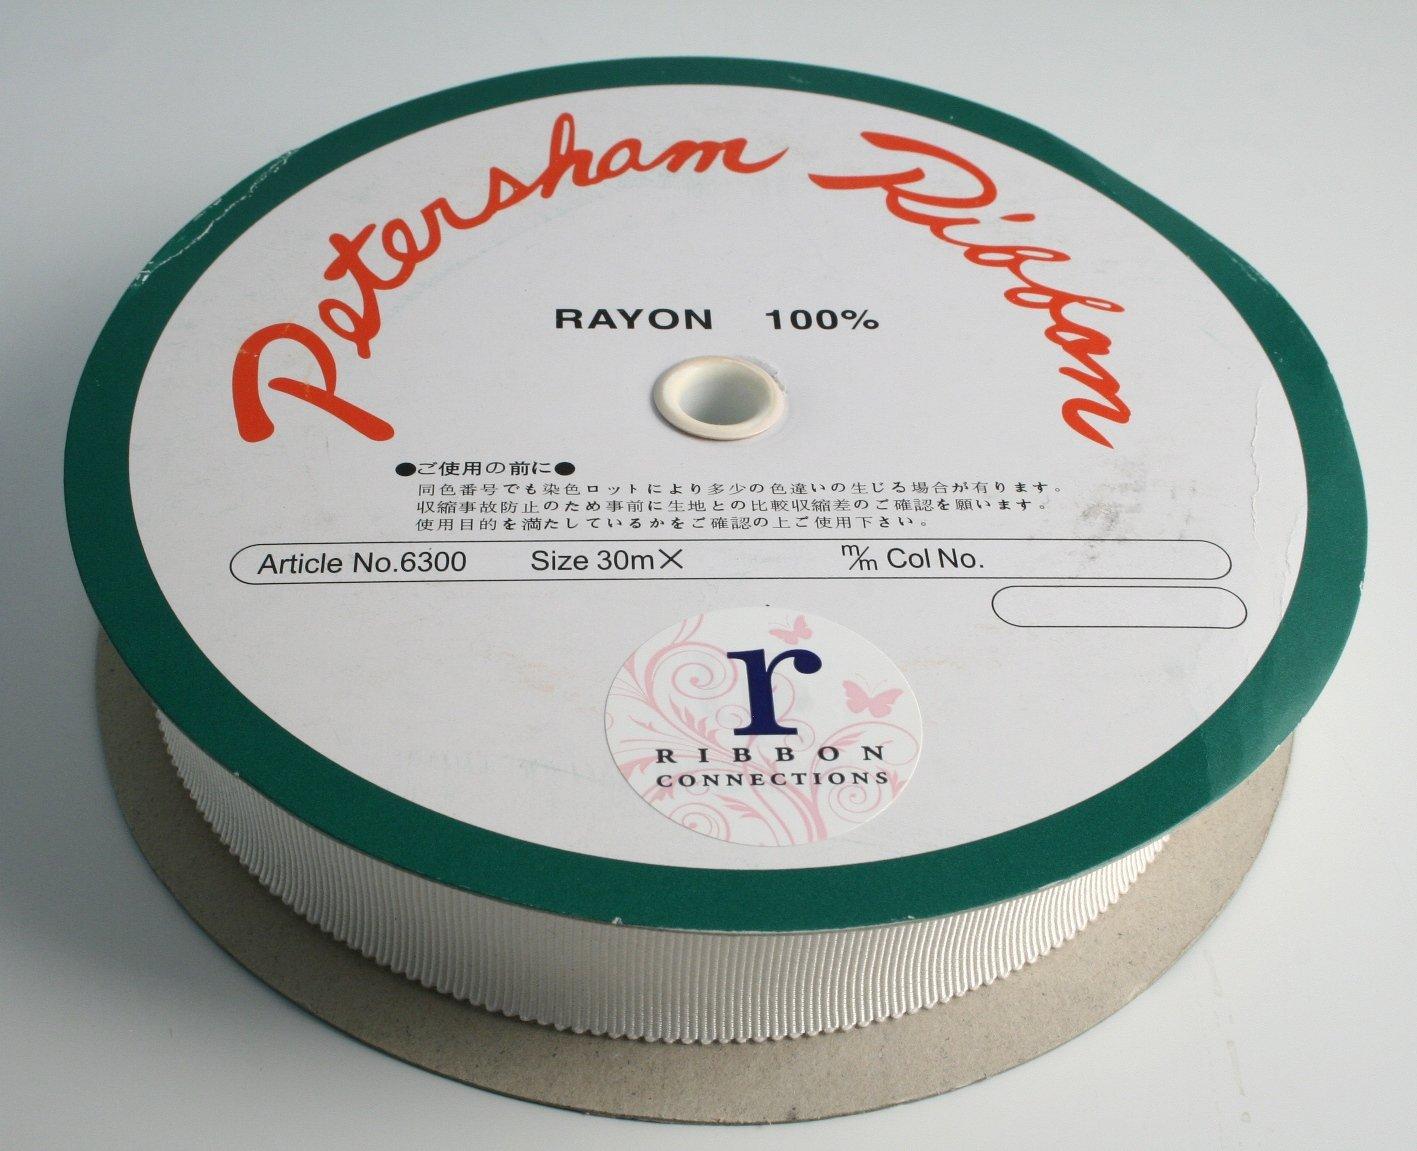 1-1/2''(36mm) 100% Rayon Petersham Ribbon 33yds (150 Natural) by Ribbon Connections (Image #2)